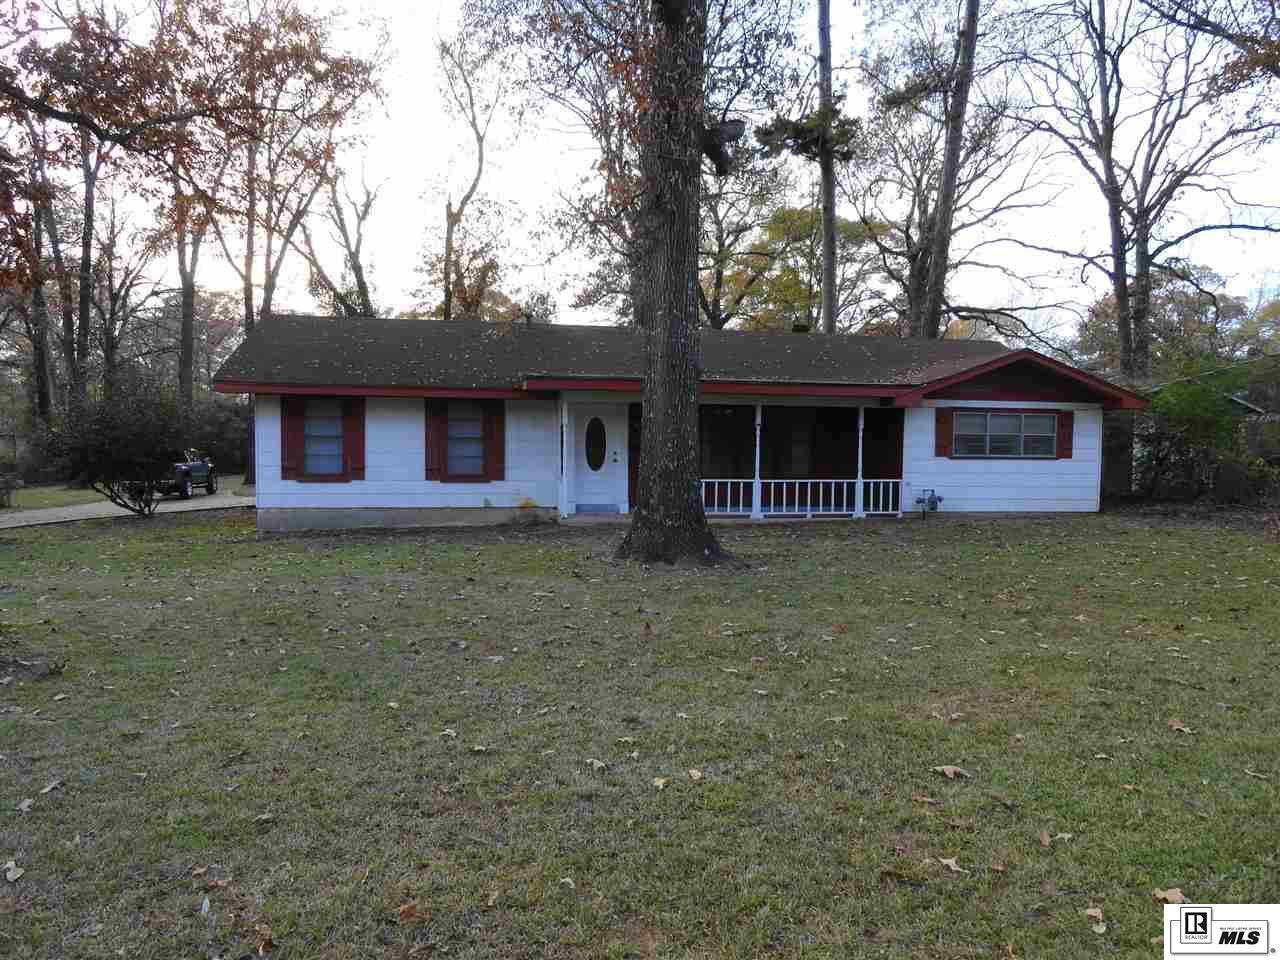 316 Cleveland St Bastrop La Mls 180650 Better Homes